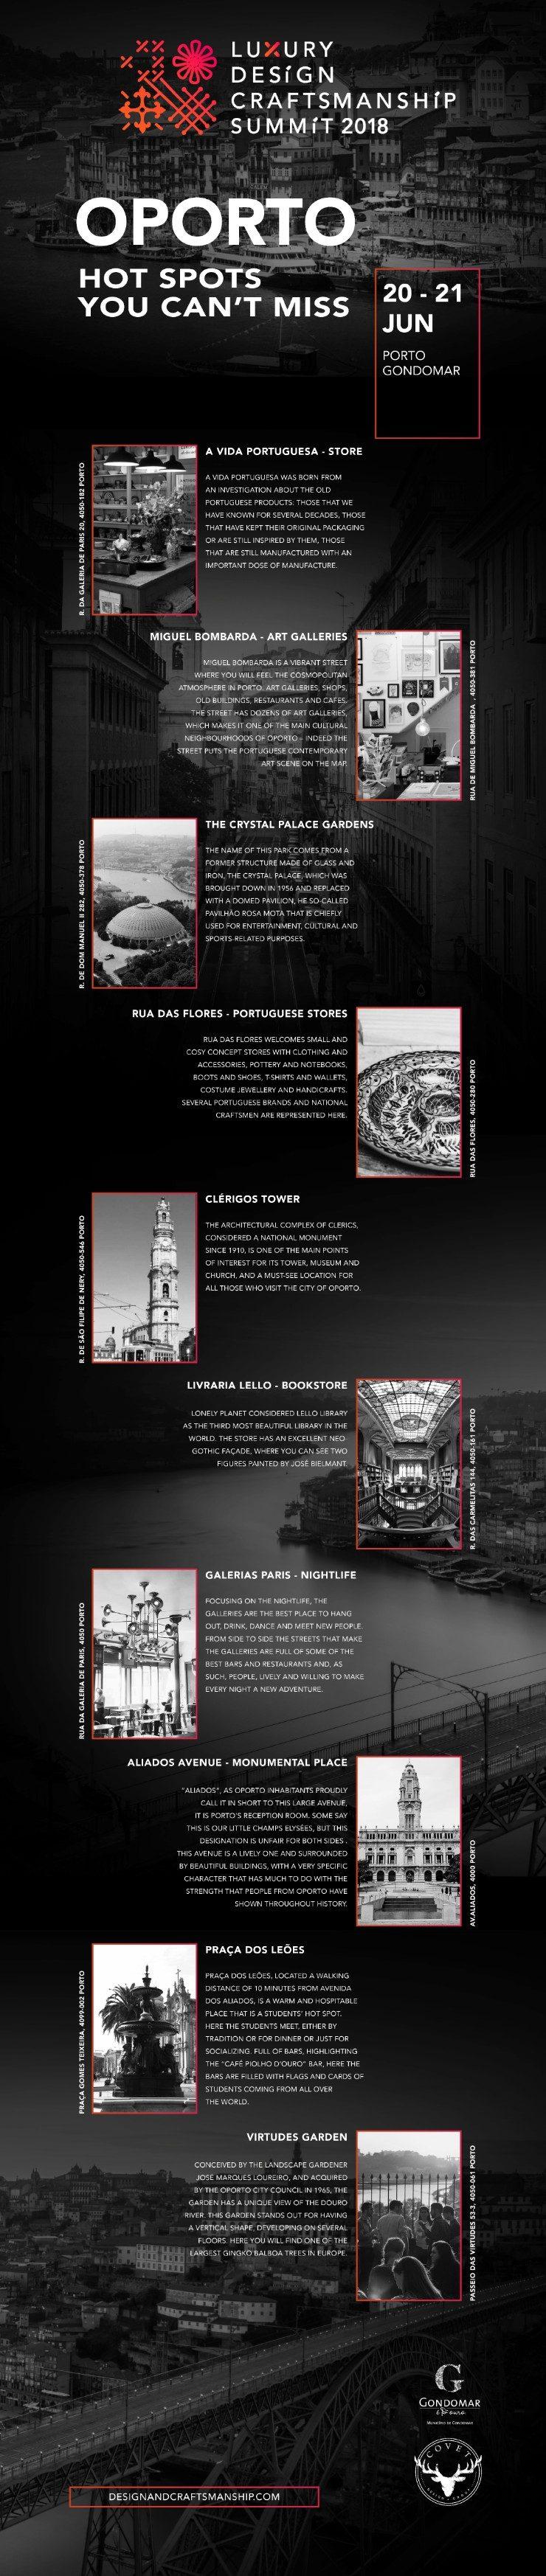 summit Reasons To Visit Luxury Design & Craftsmanship Summit oporto map summit 001